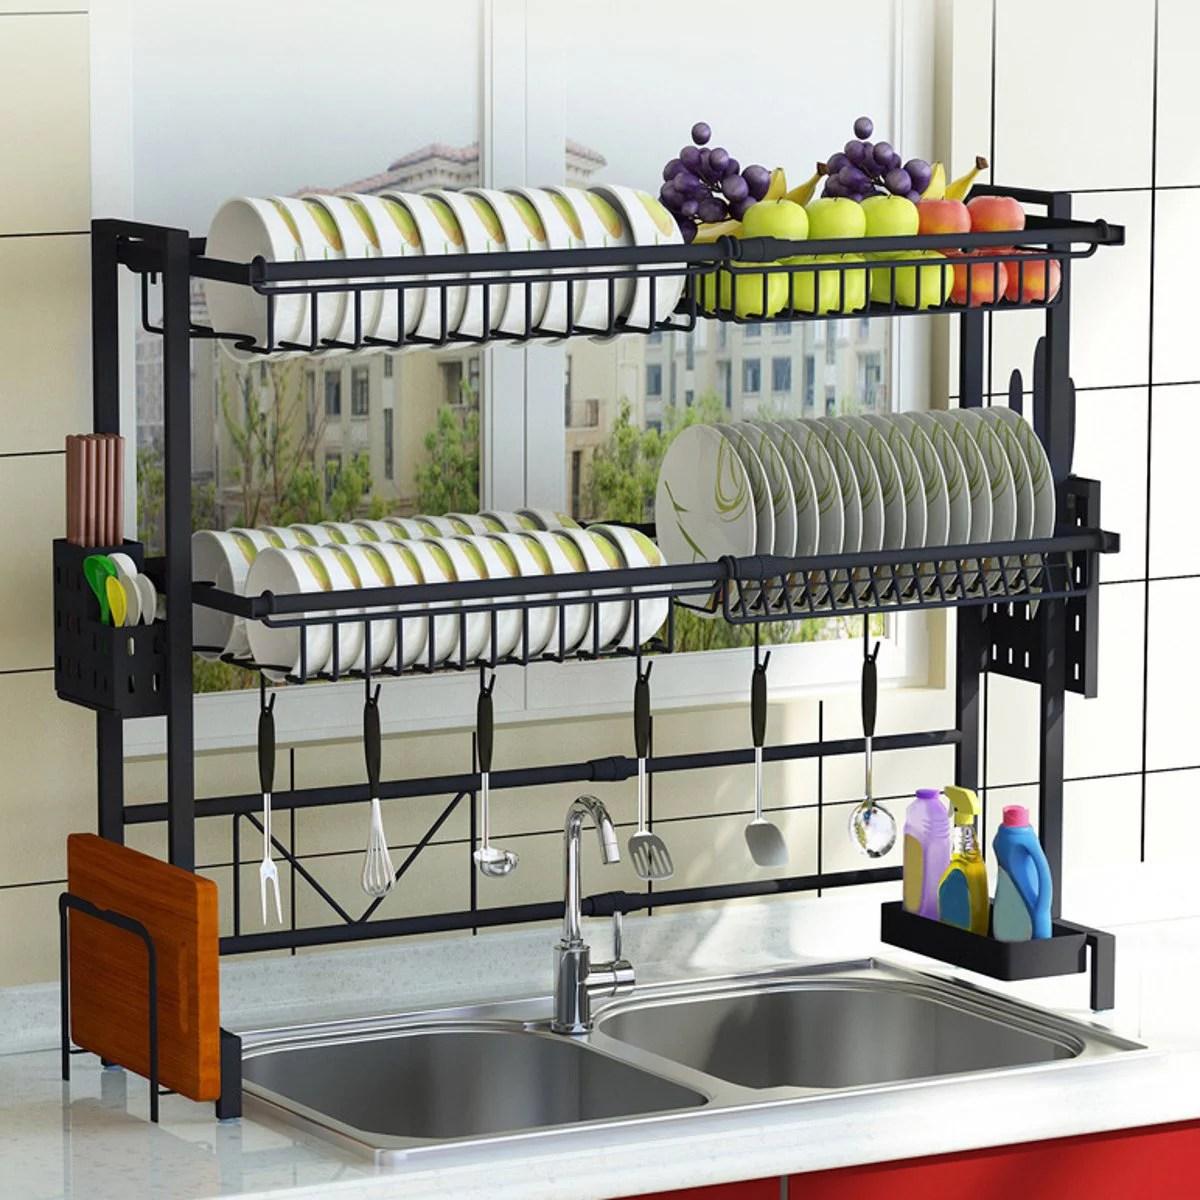 upgraded 1 2tier sink rack dish drainer for kitchen sink racks stainless steel over the sink shelf storage rack